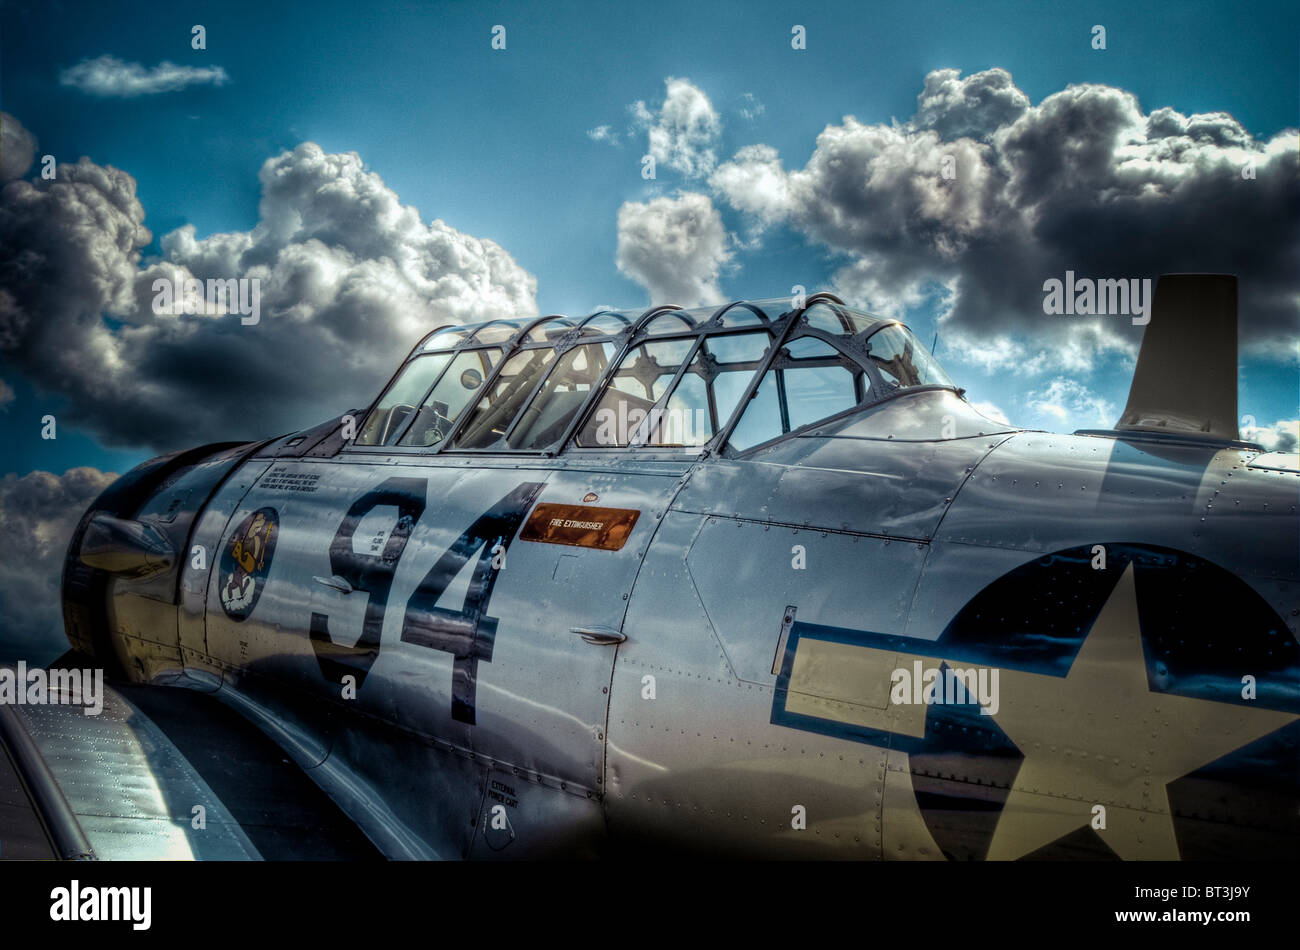 AT-6 Texan aeroplane number 94 - Stock Image